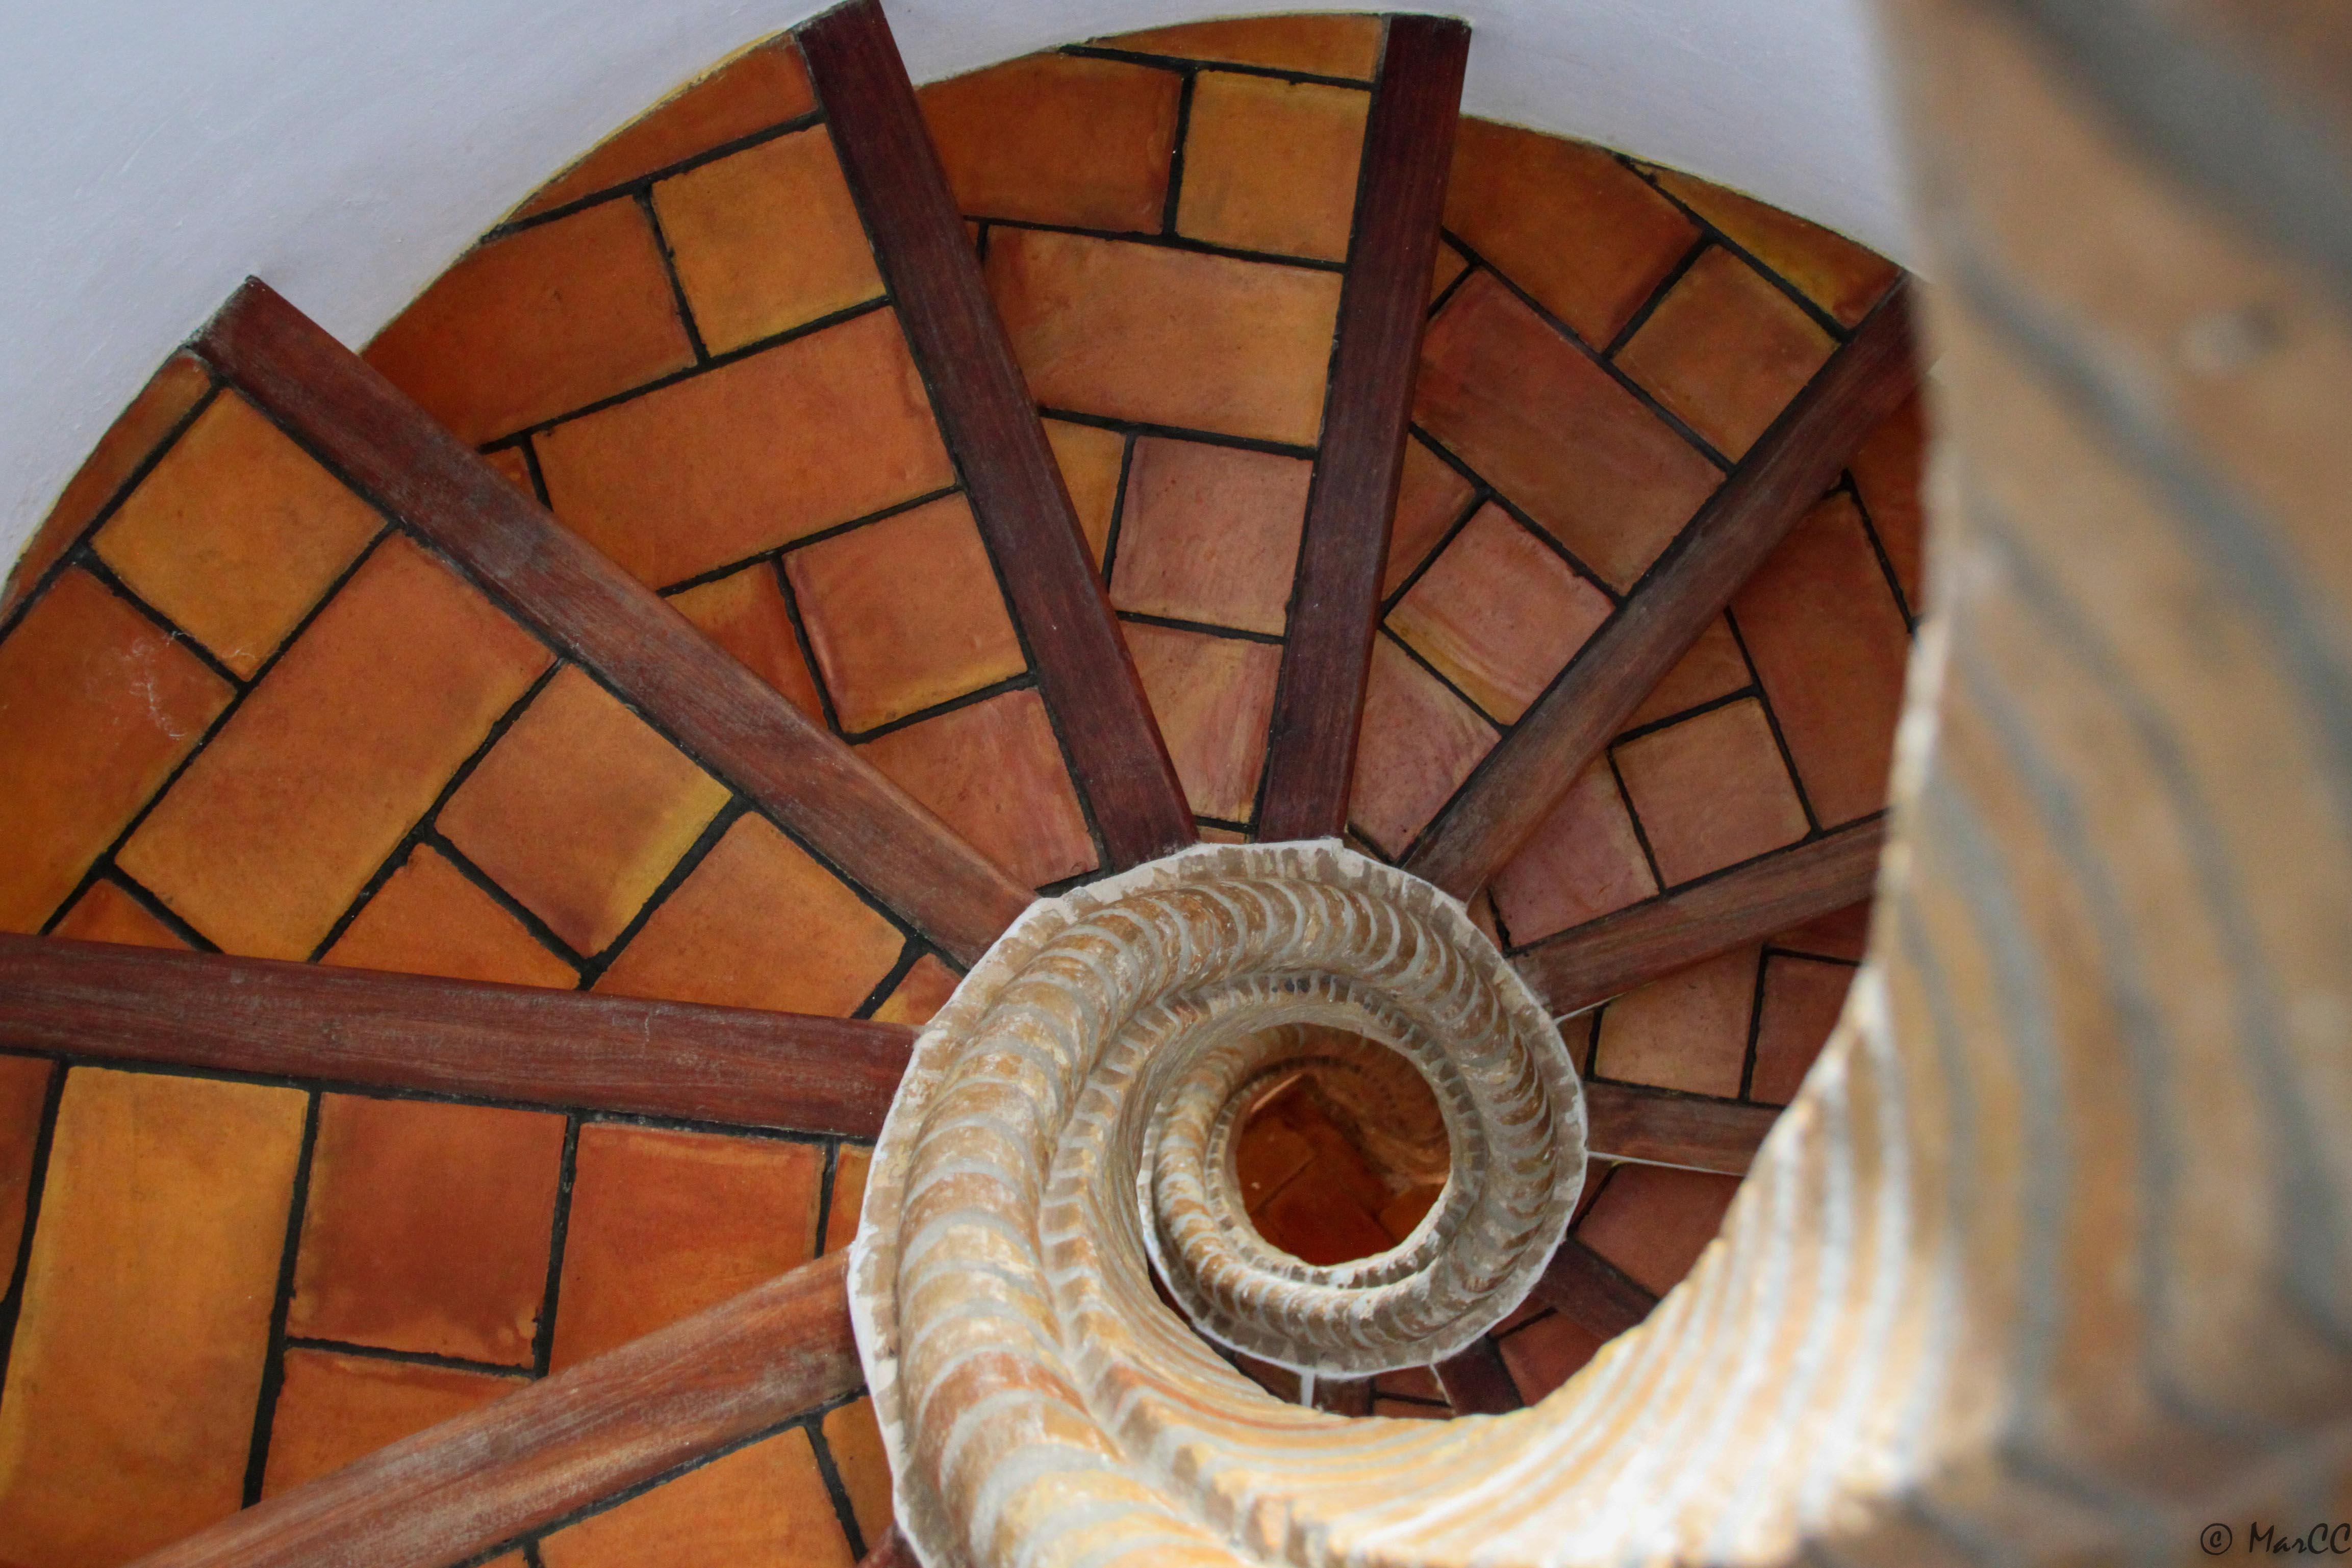 La escalera de caracol – El mundo a través de ti